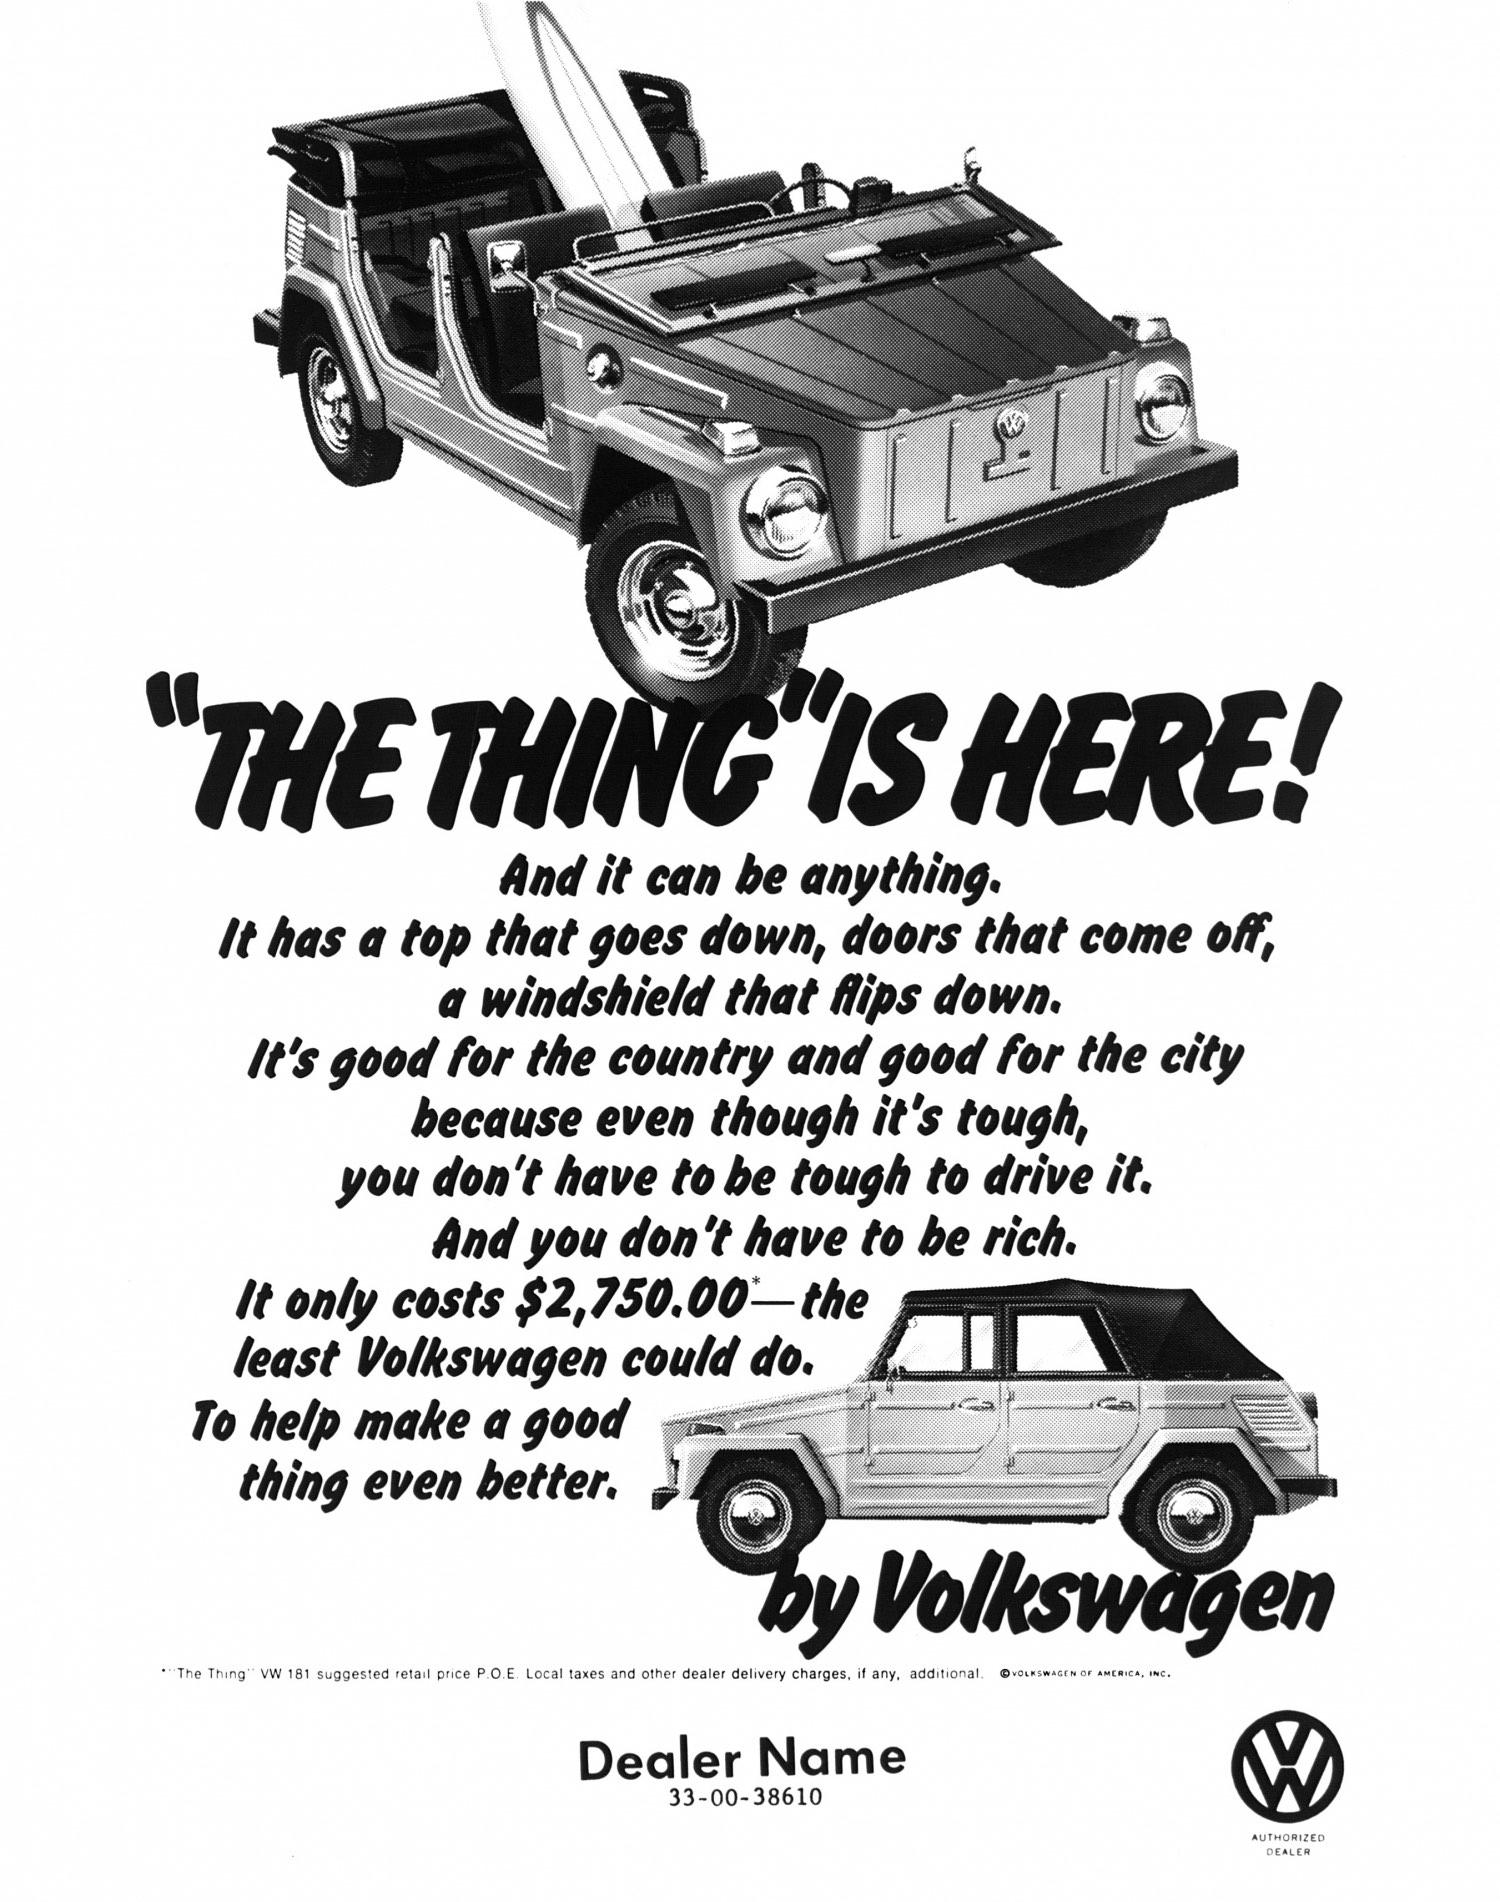 1973 Volkswagen Thing advertisement